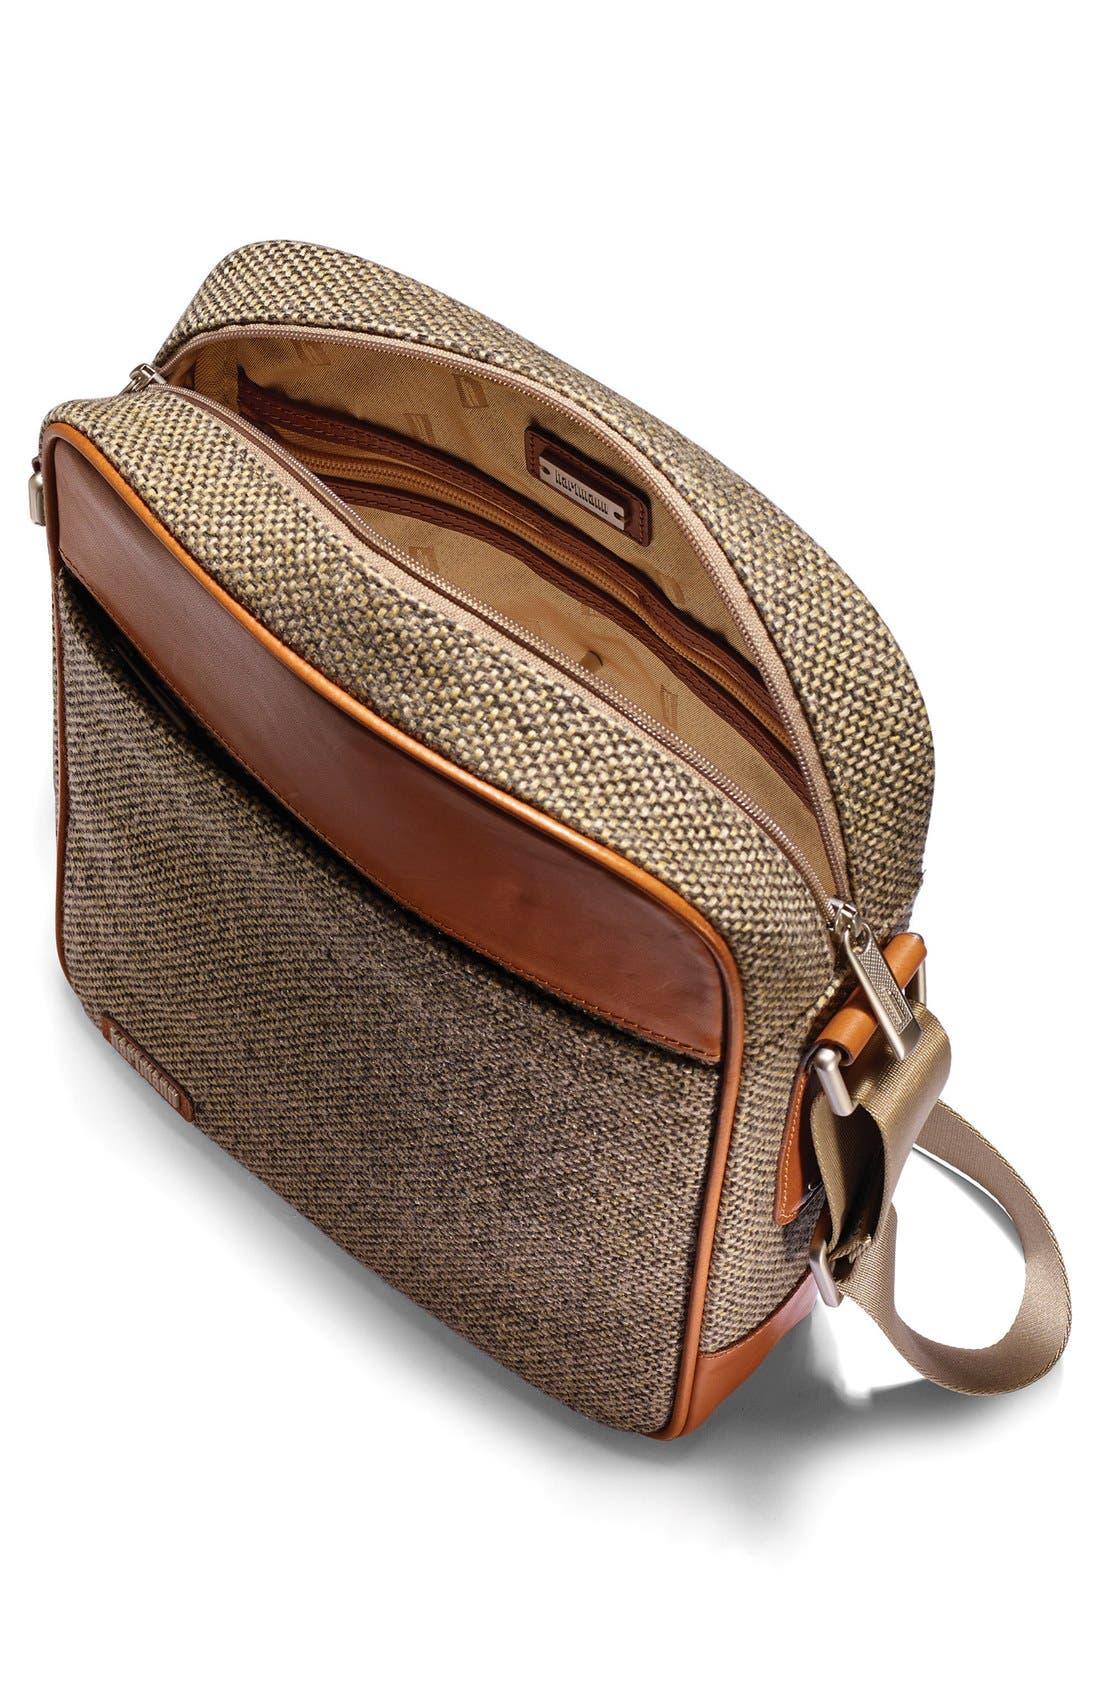 'Tweed Belting' Crossbody Bag,                             Alternate thumbnail 2, color,                             217